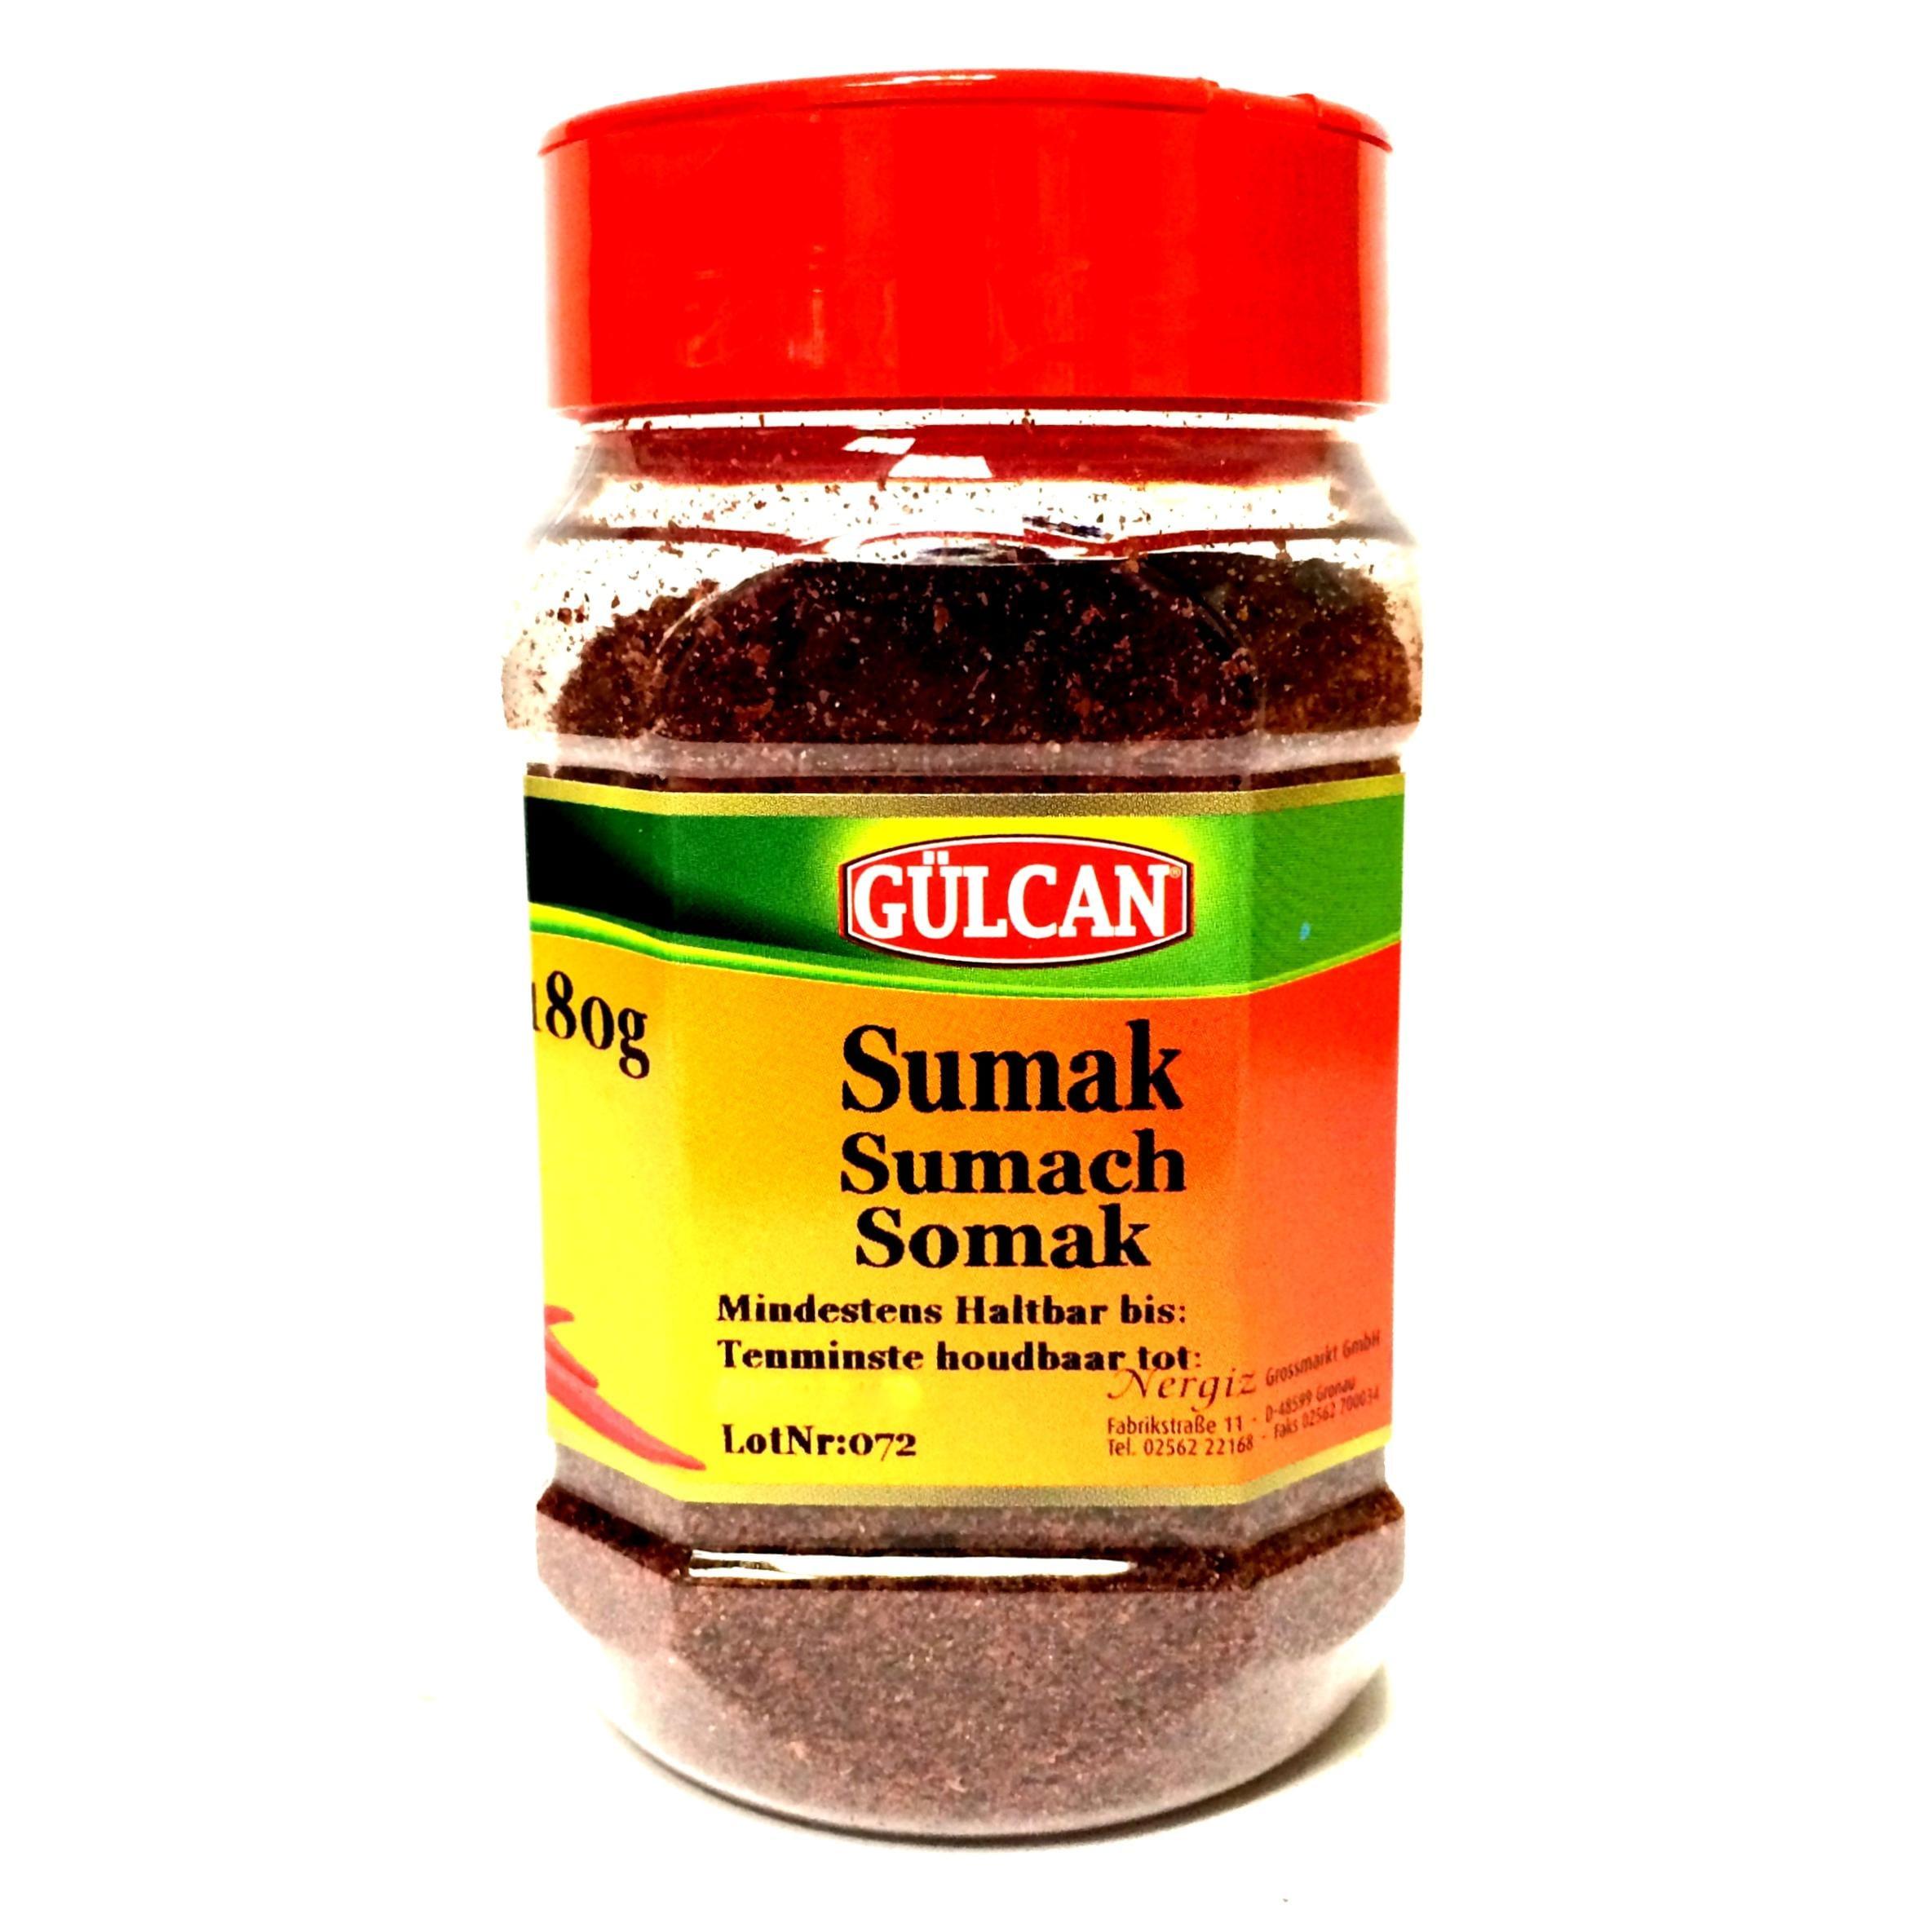 Gülcan Sumak – Sumach Gewürz (gemahlen) 180g